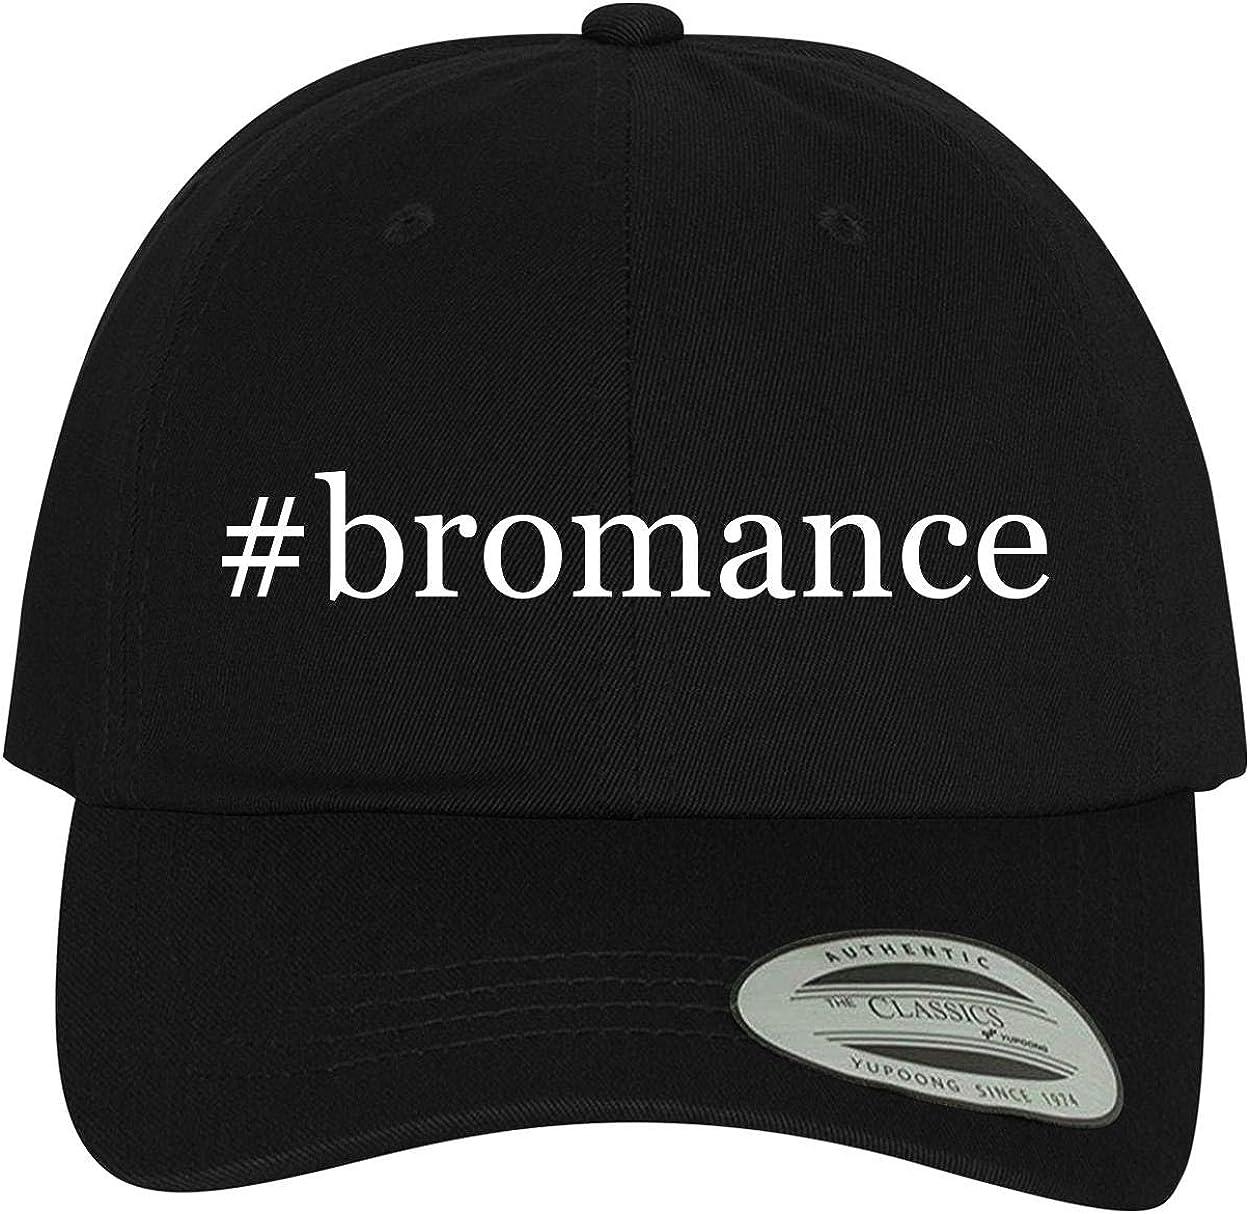 BH Cool Designs #Bromance Comfortable Dad Hat Baseball Cap